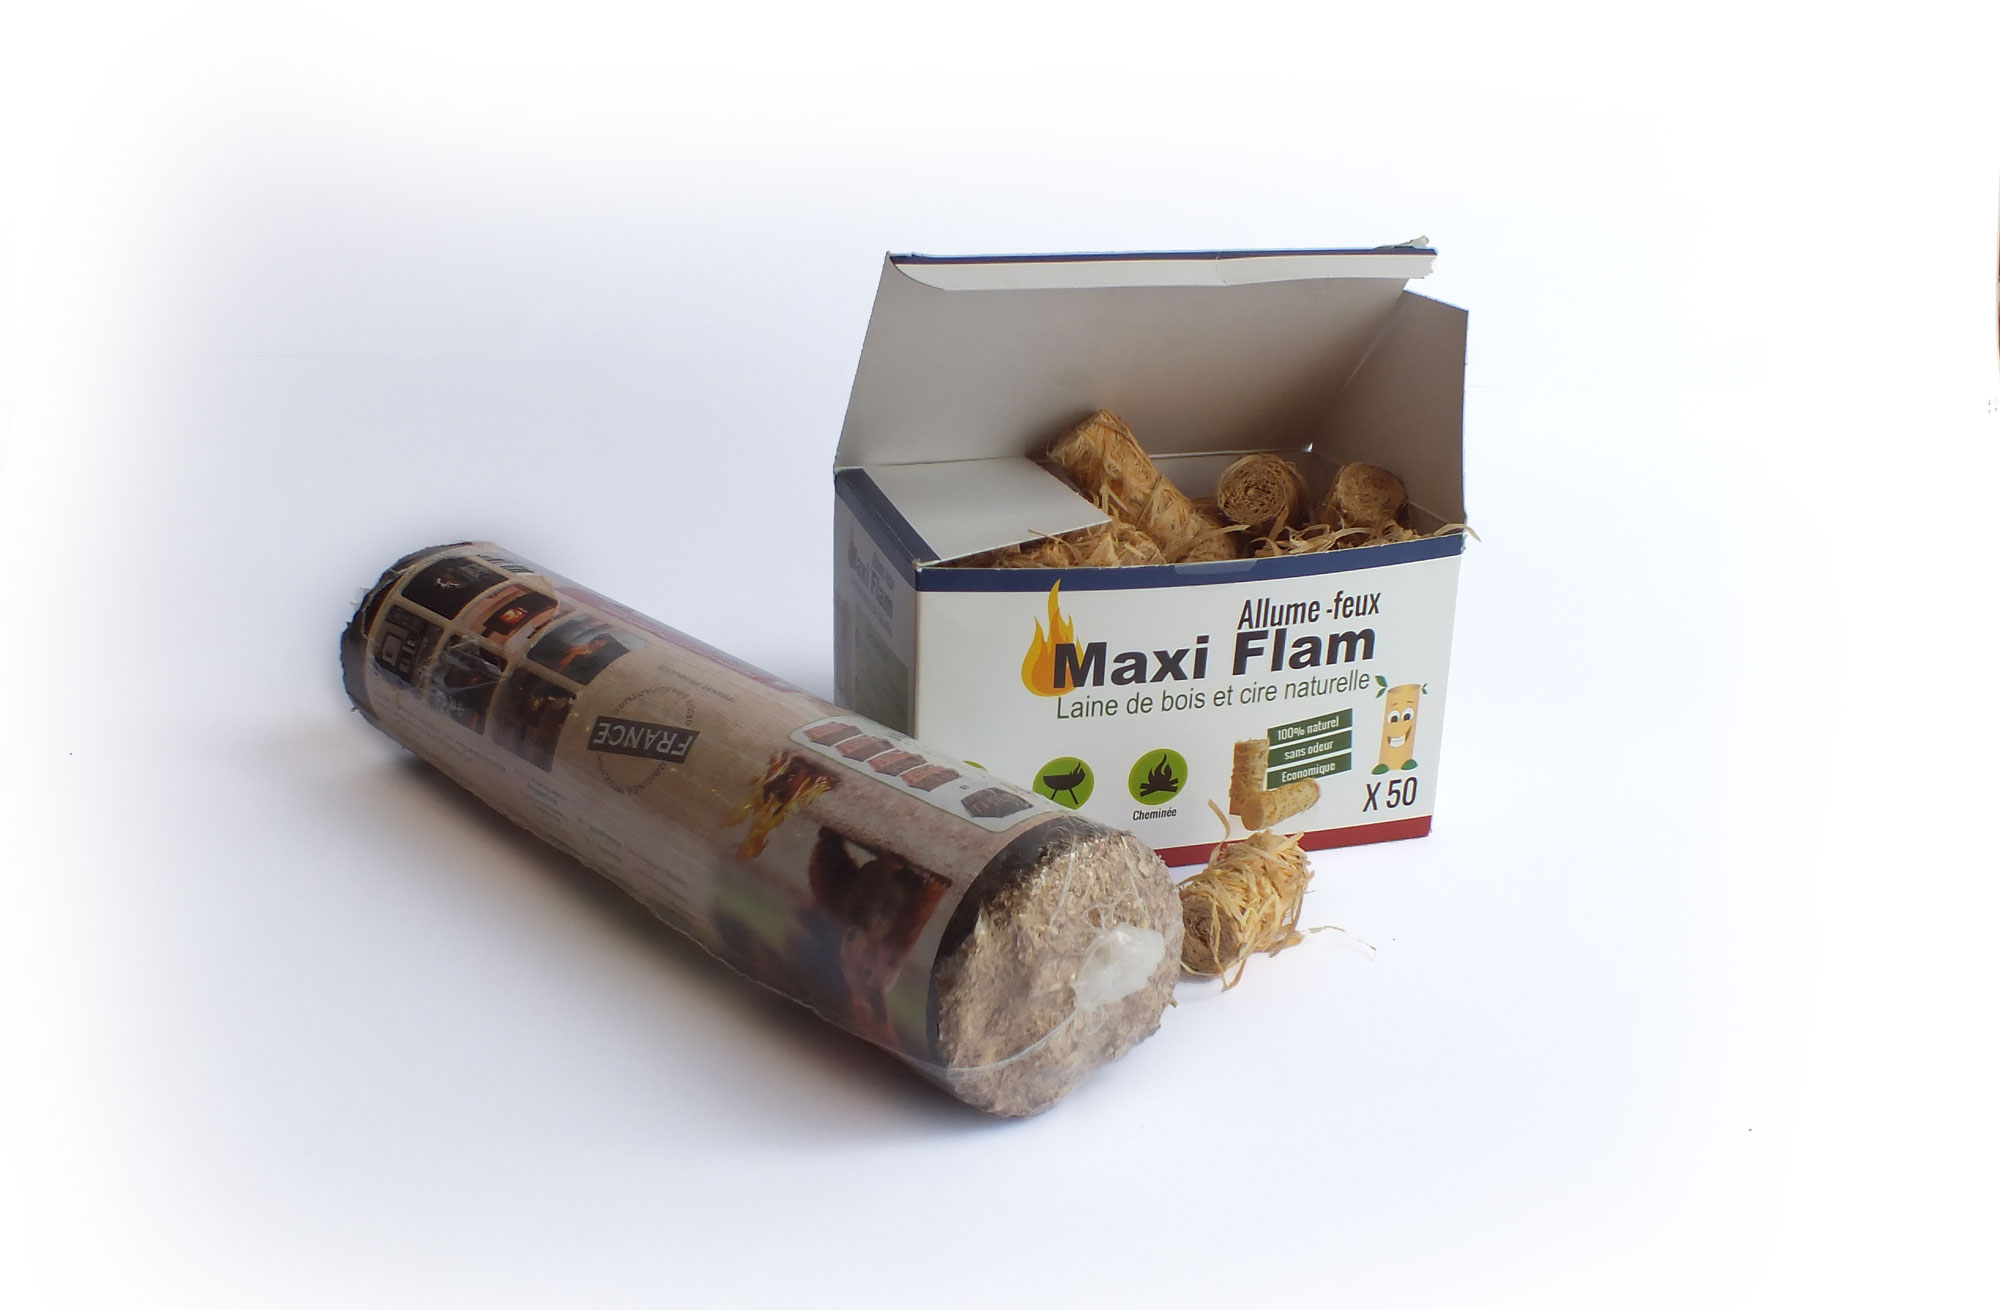 emballage allume feu Maxi Flamme